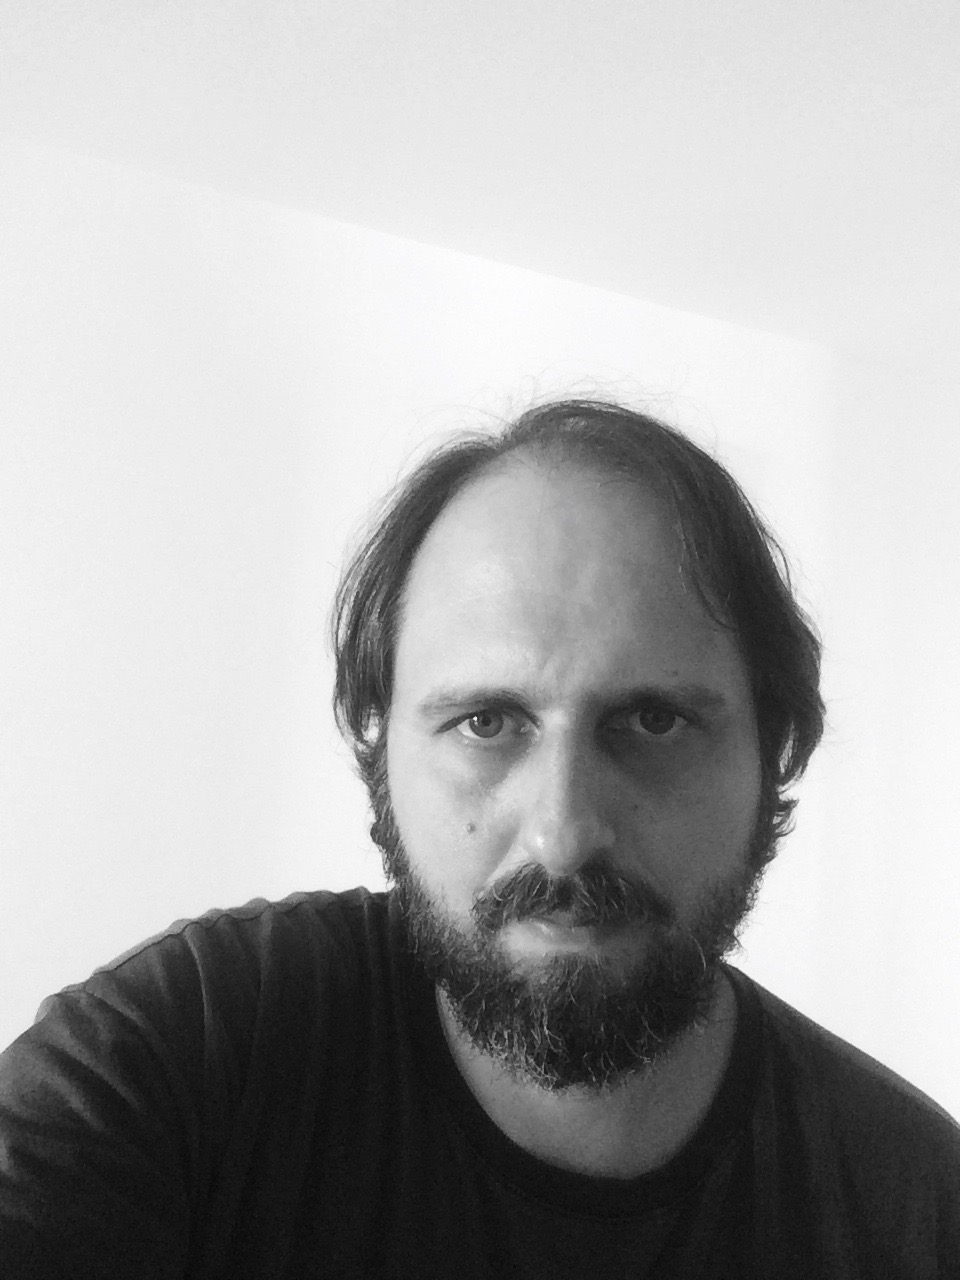 Marcos Muccini